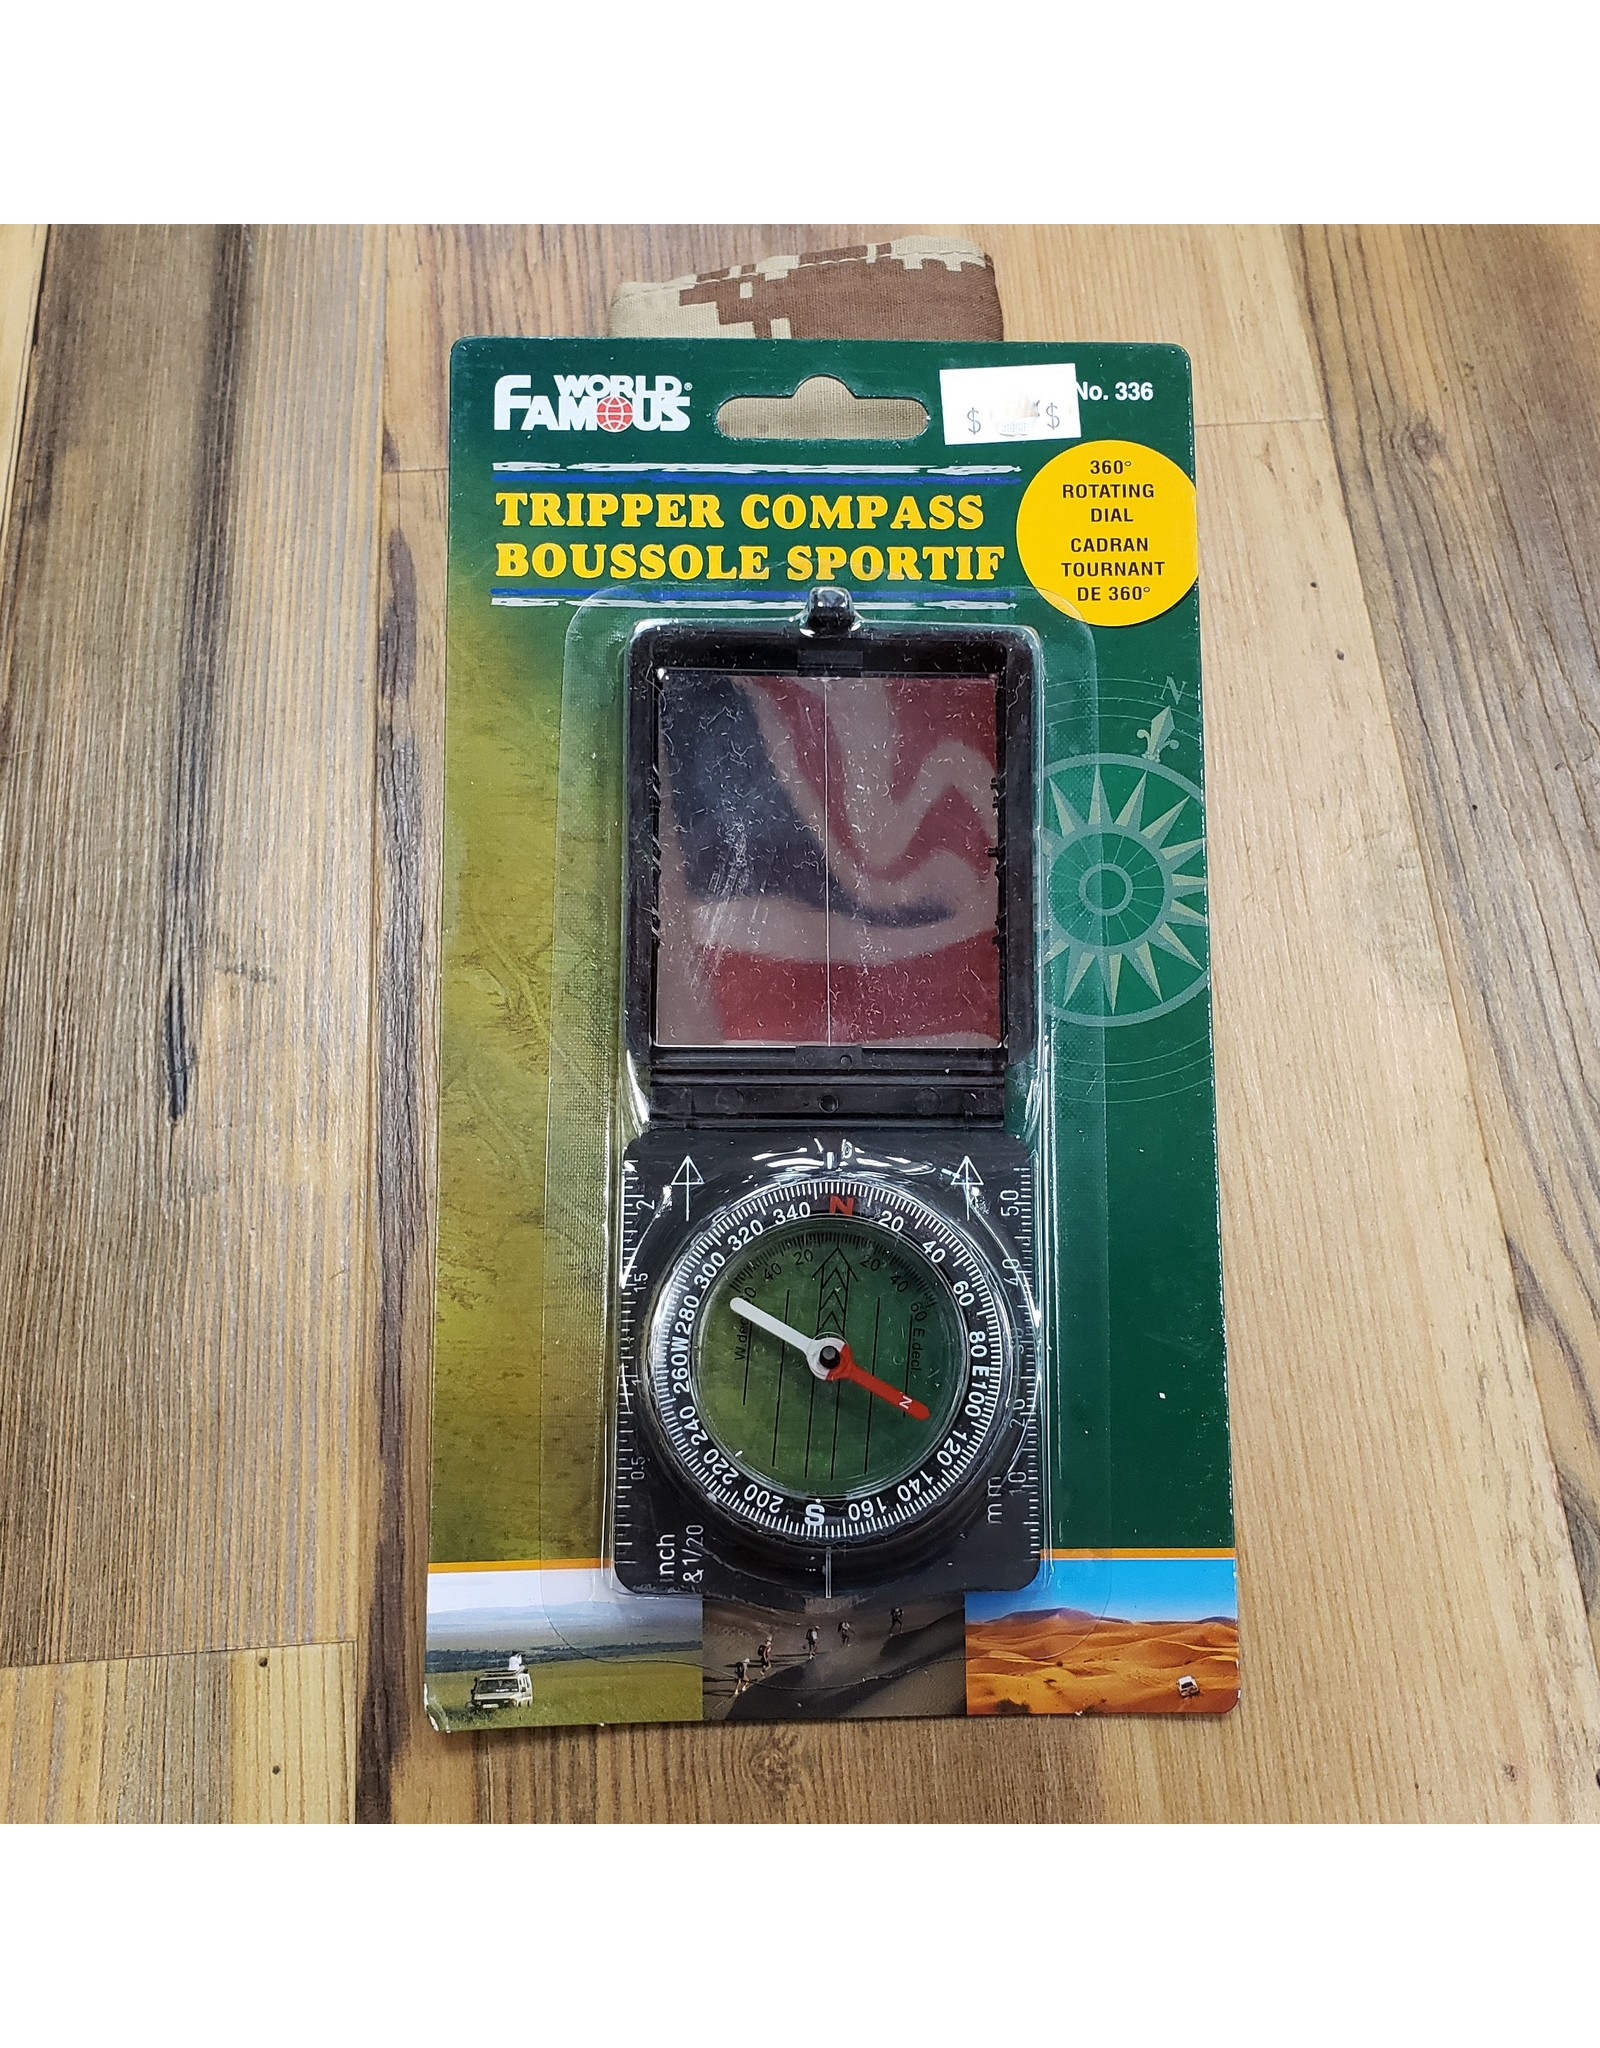 WORLD FAMOUS SALES TRIPPER COMPASS